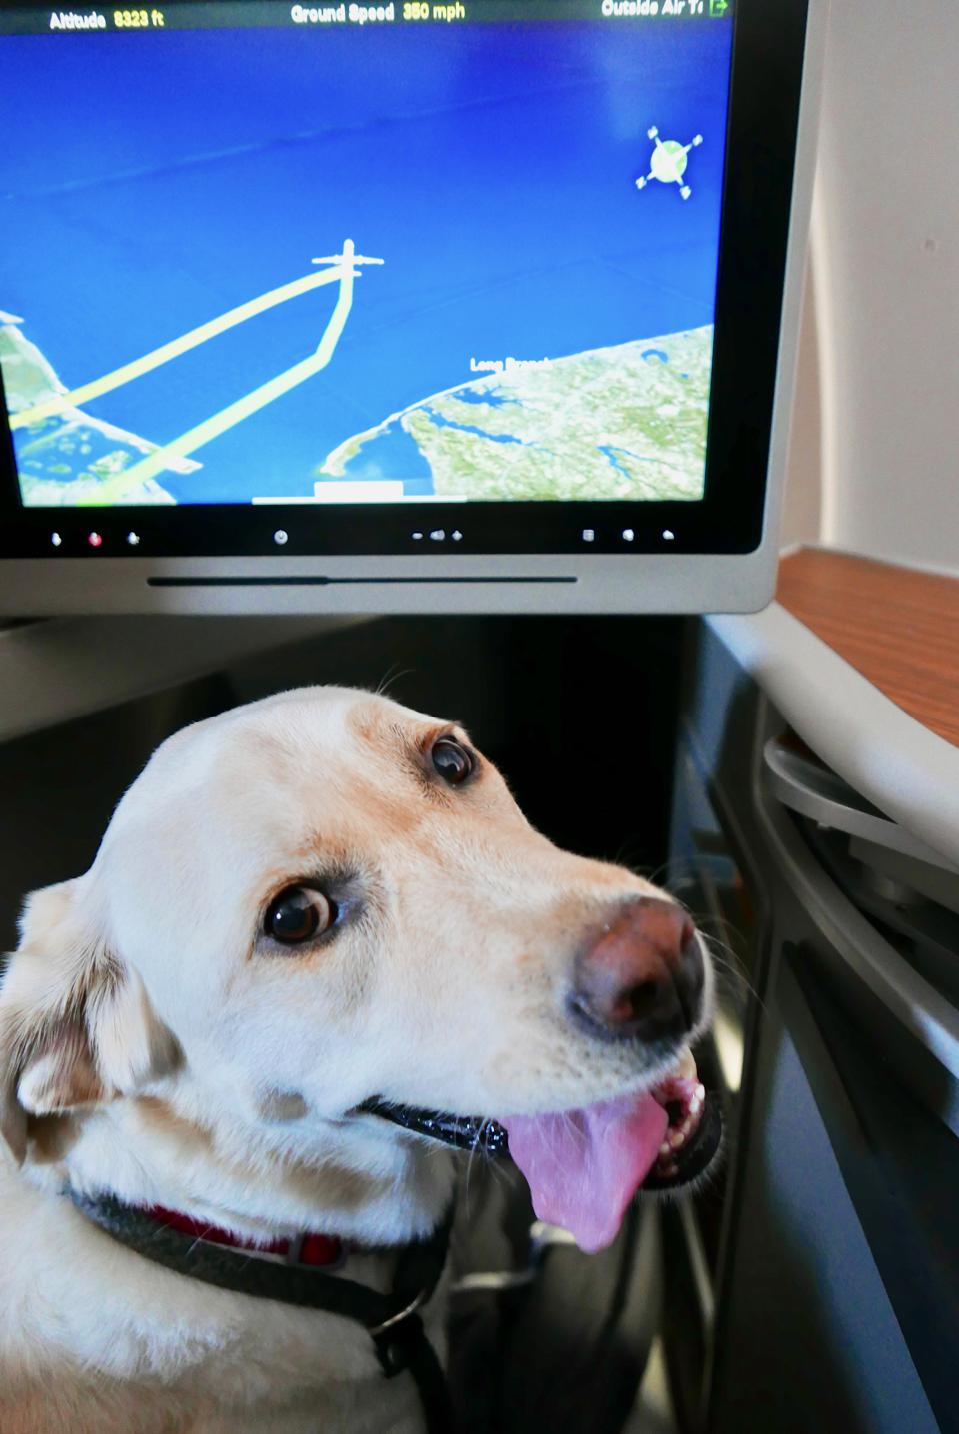 Labrador Retriever on an Airplane